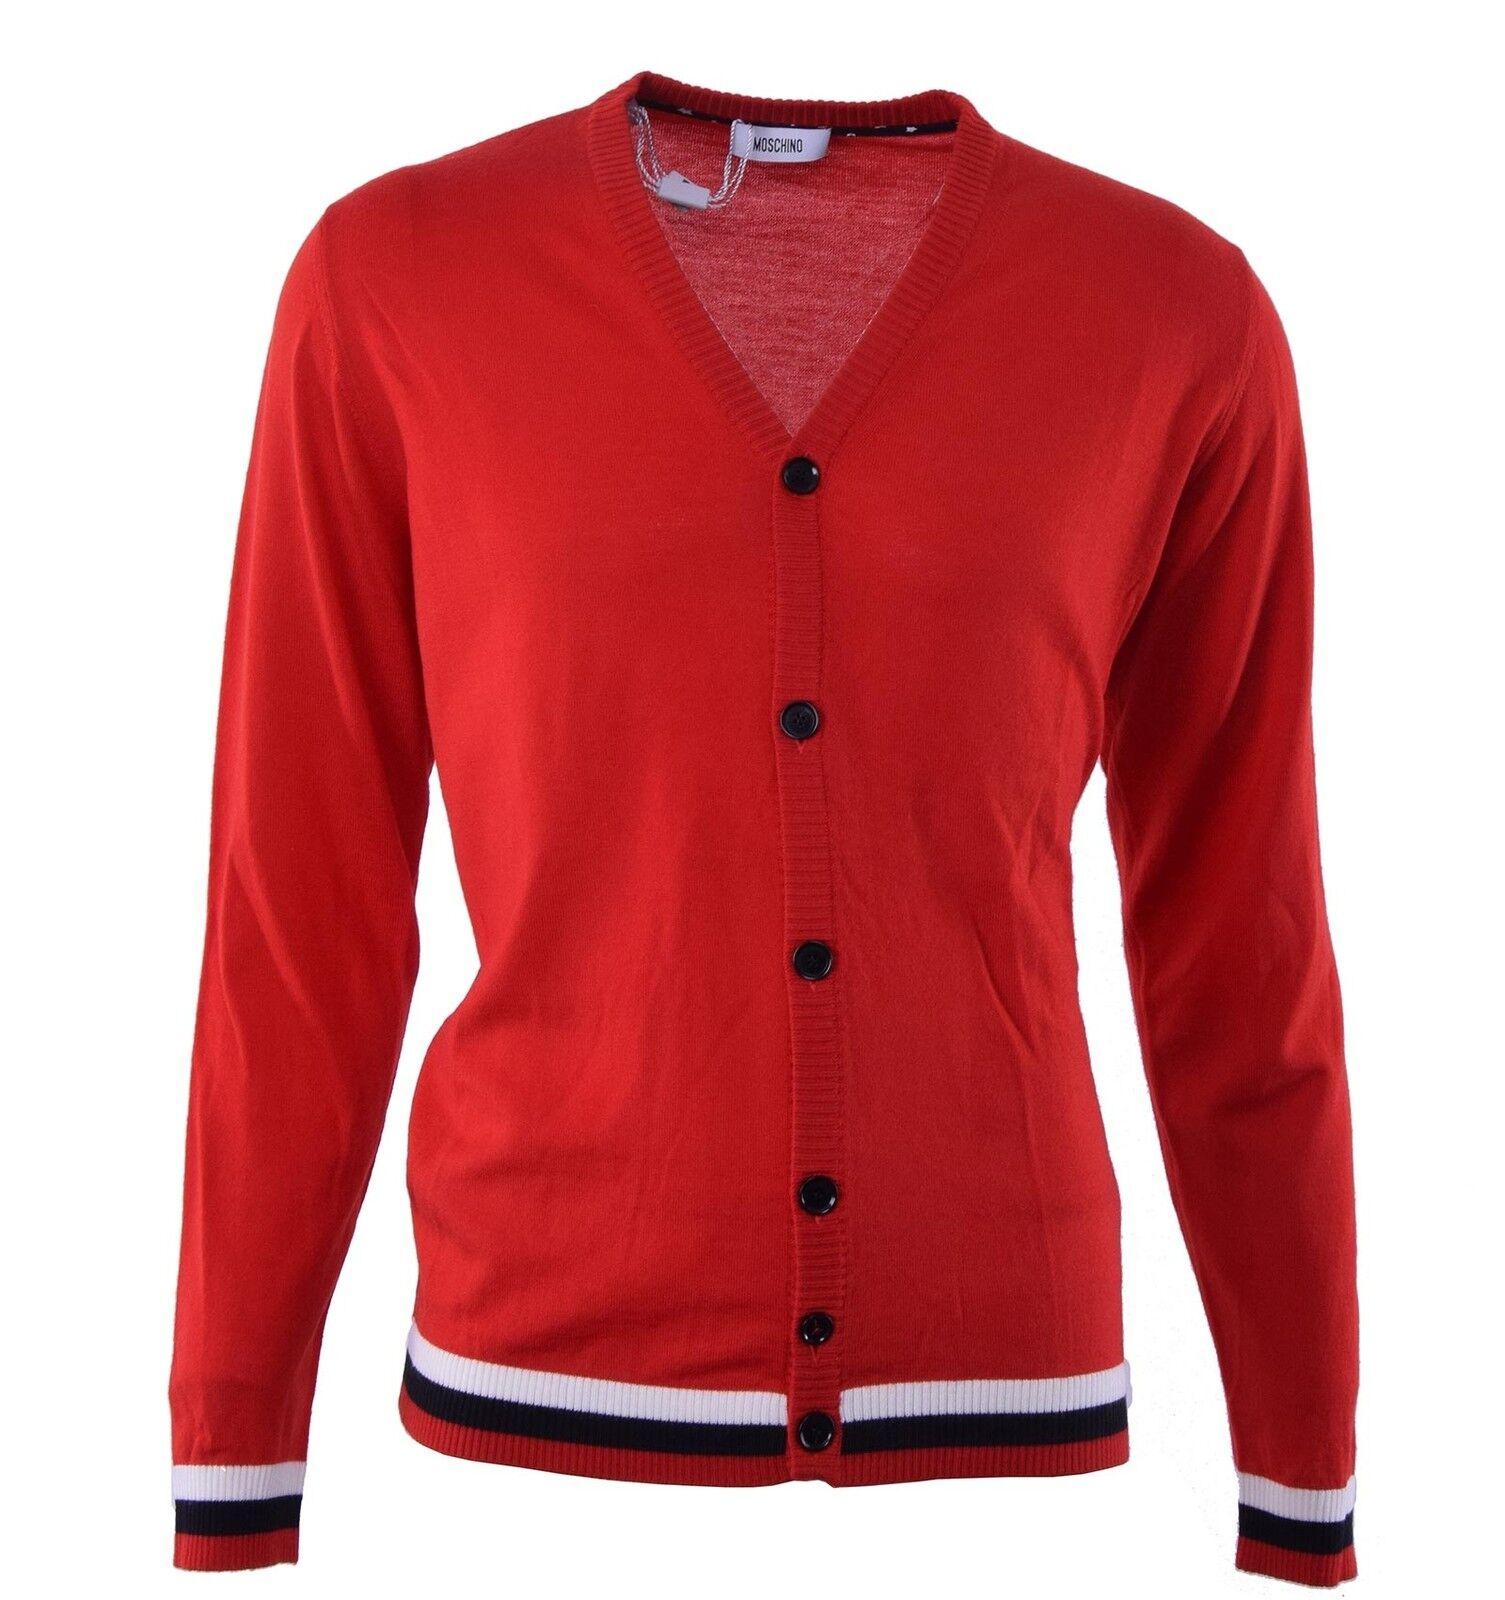 MOSCHINO tricotée laine vierge Veste tricotée MOSCHINO Rouge Virgin laine cardigan rouge 04479 df047c